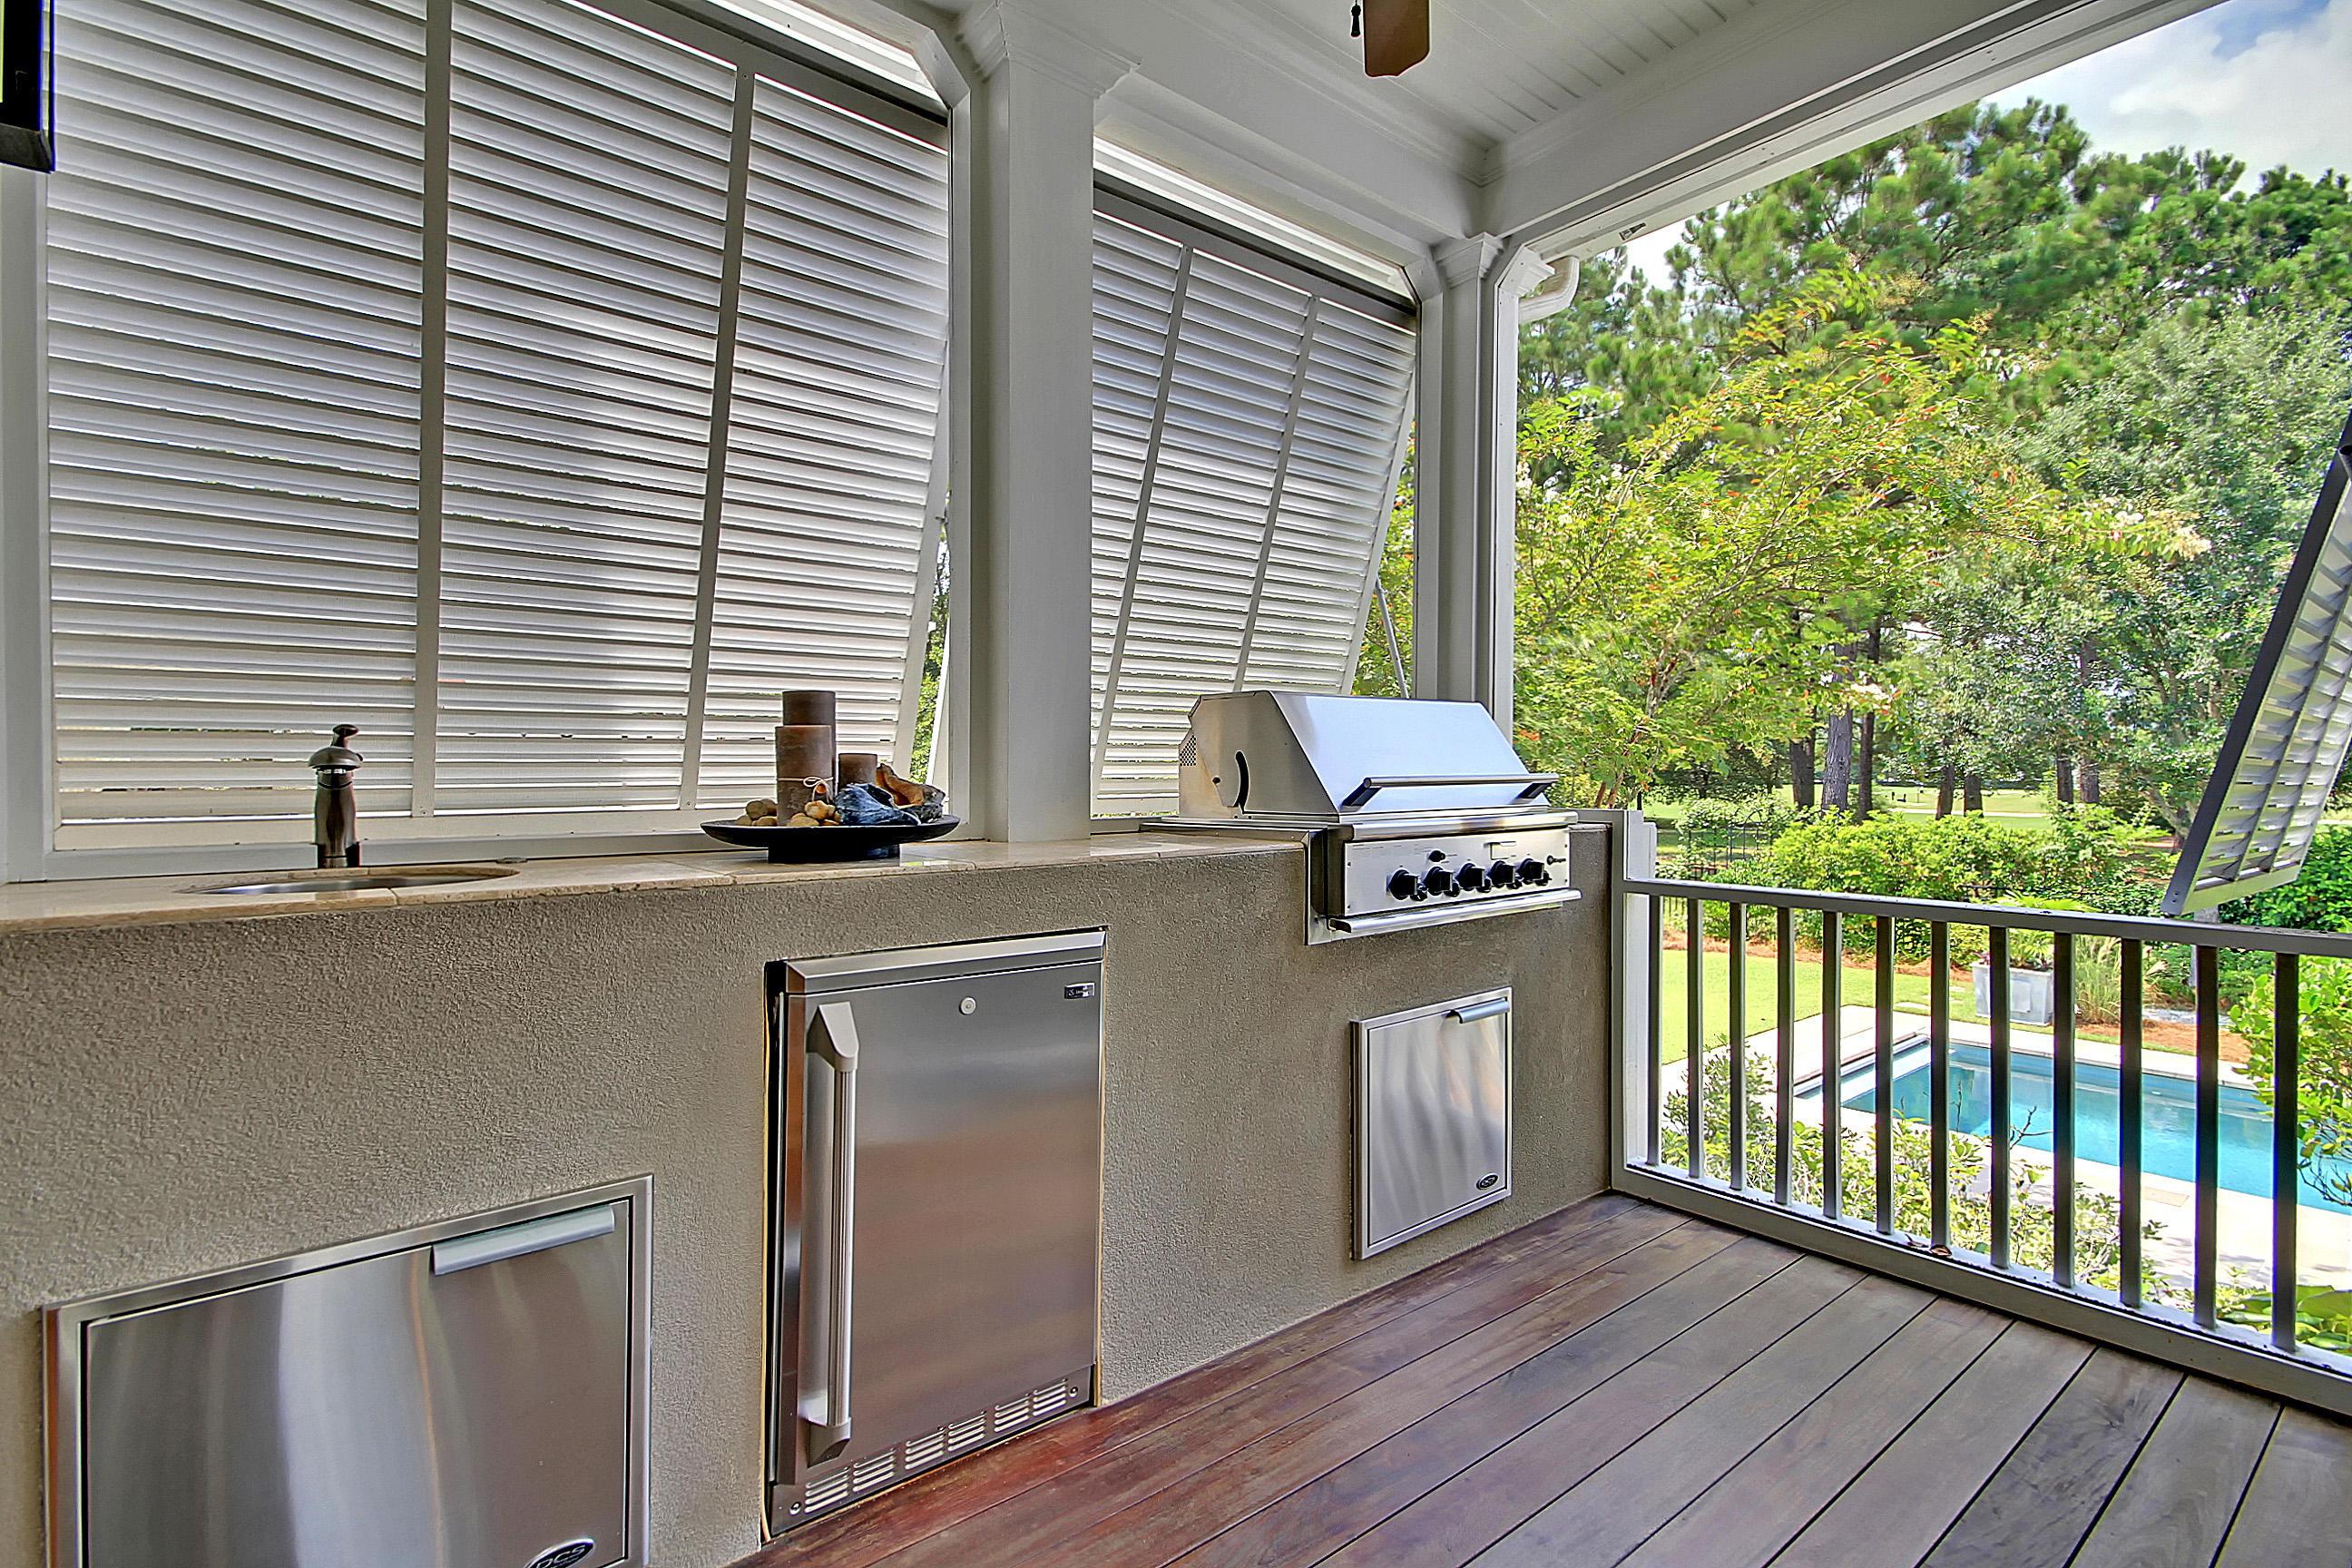 Daniel Island Homes For Sale - 520 Island Park, Daniel Island, SC - 51